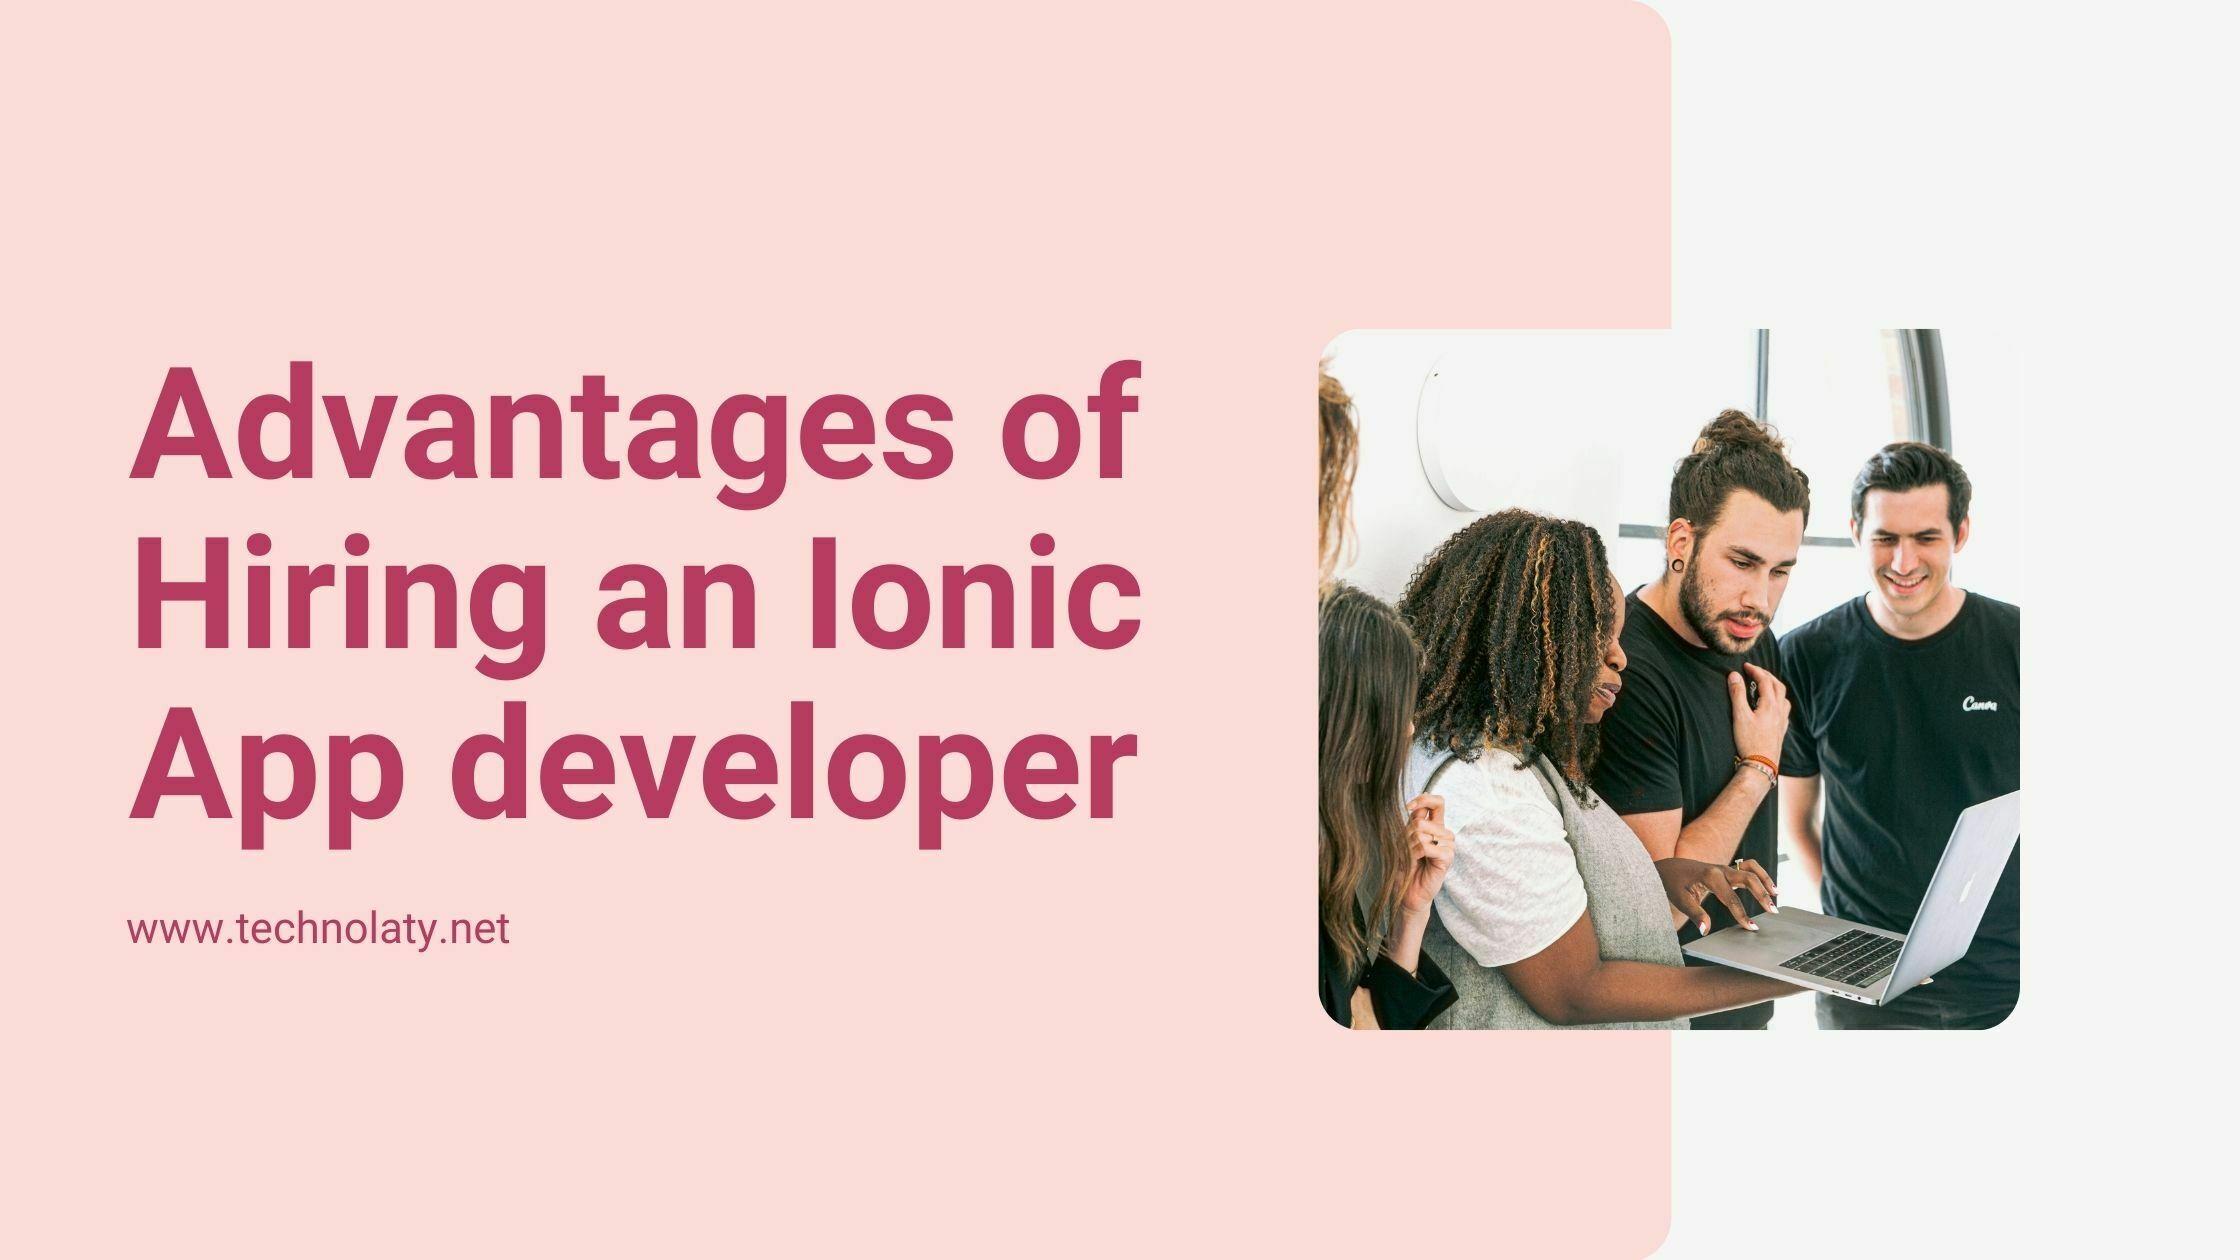 Iconic App Developer